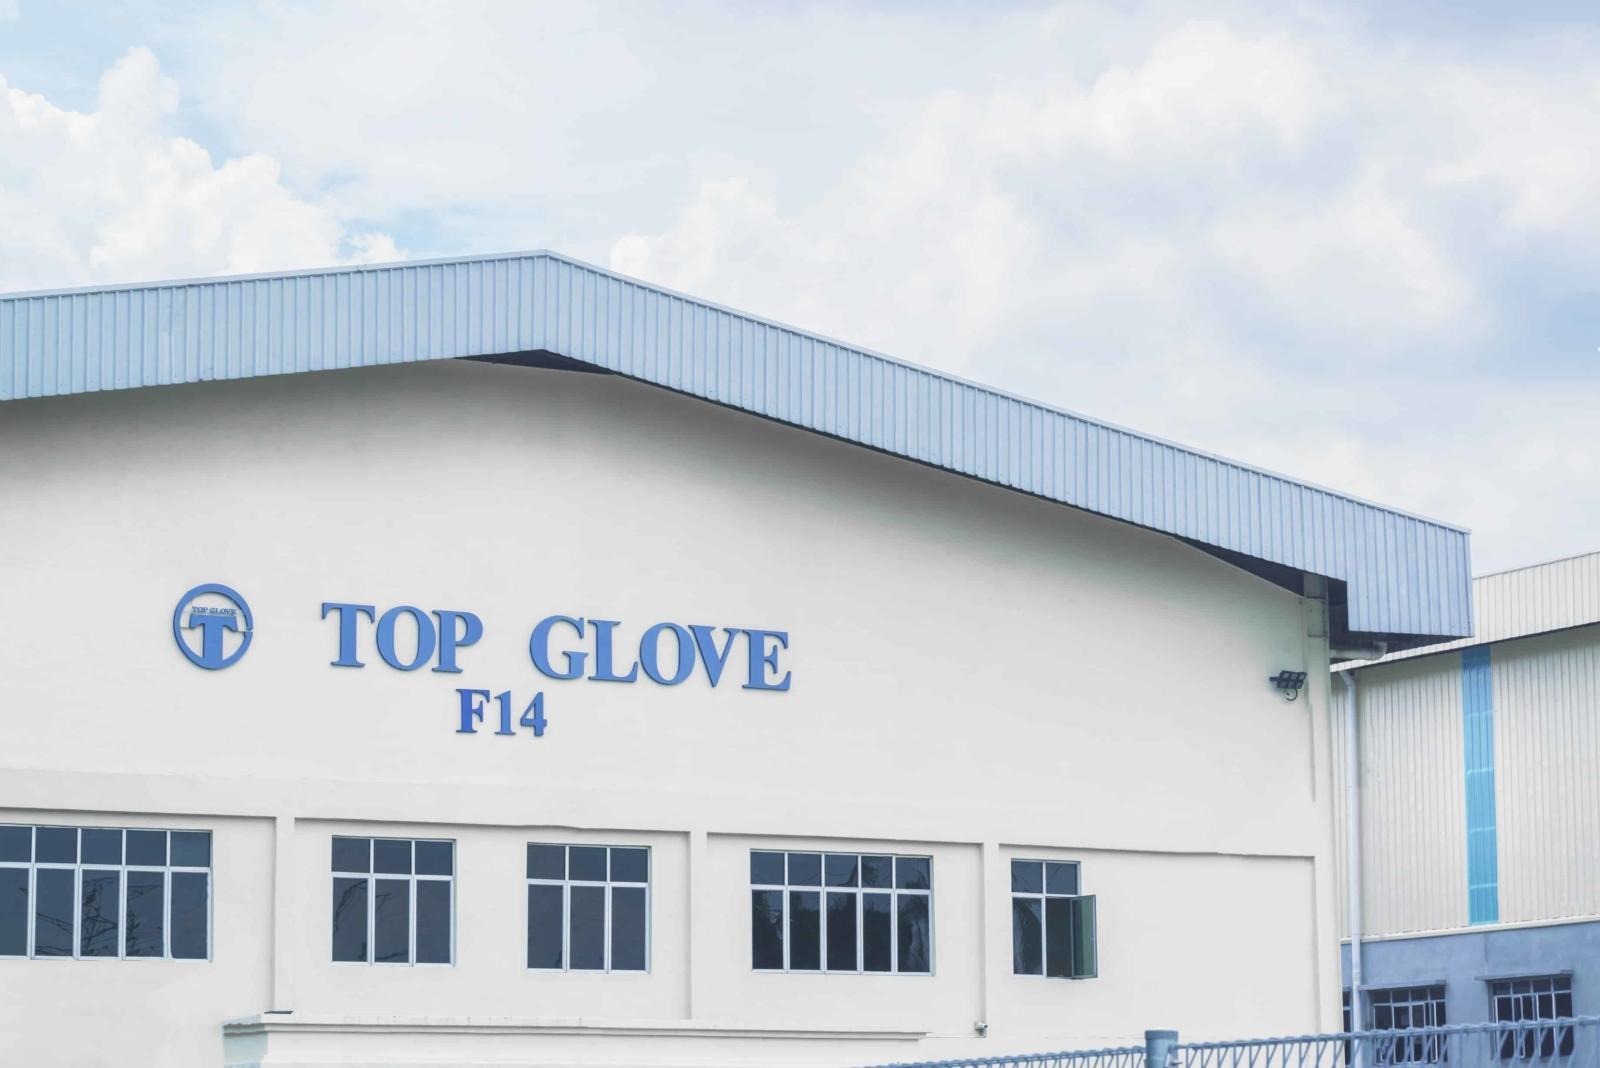 Top Glove | Selangor, Malaysia